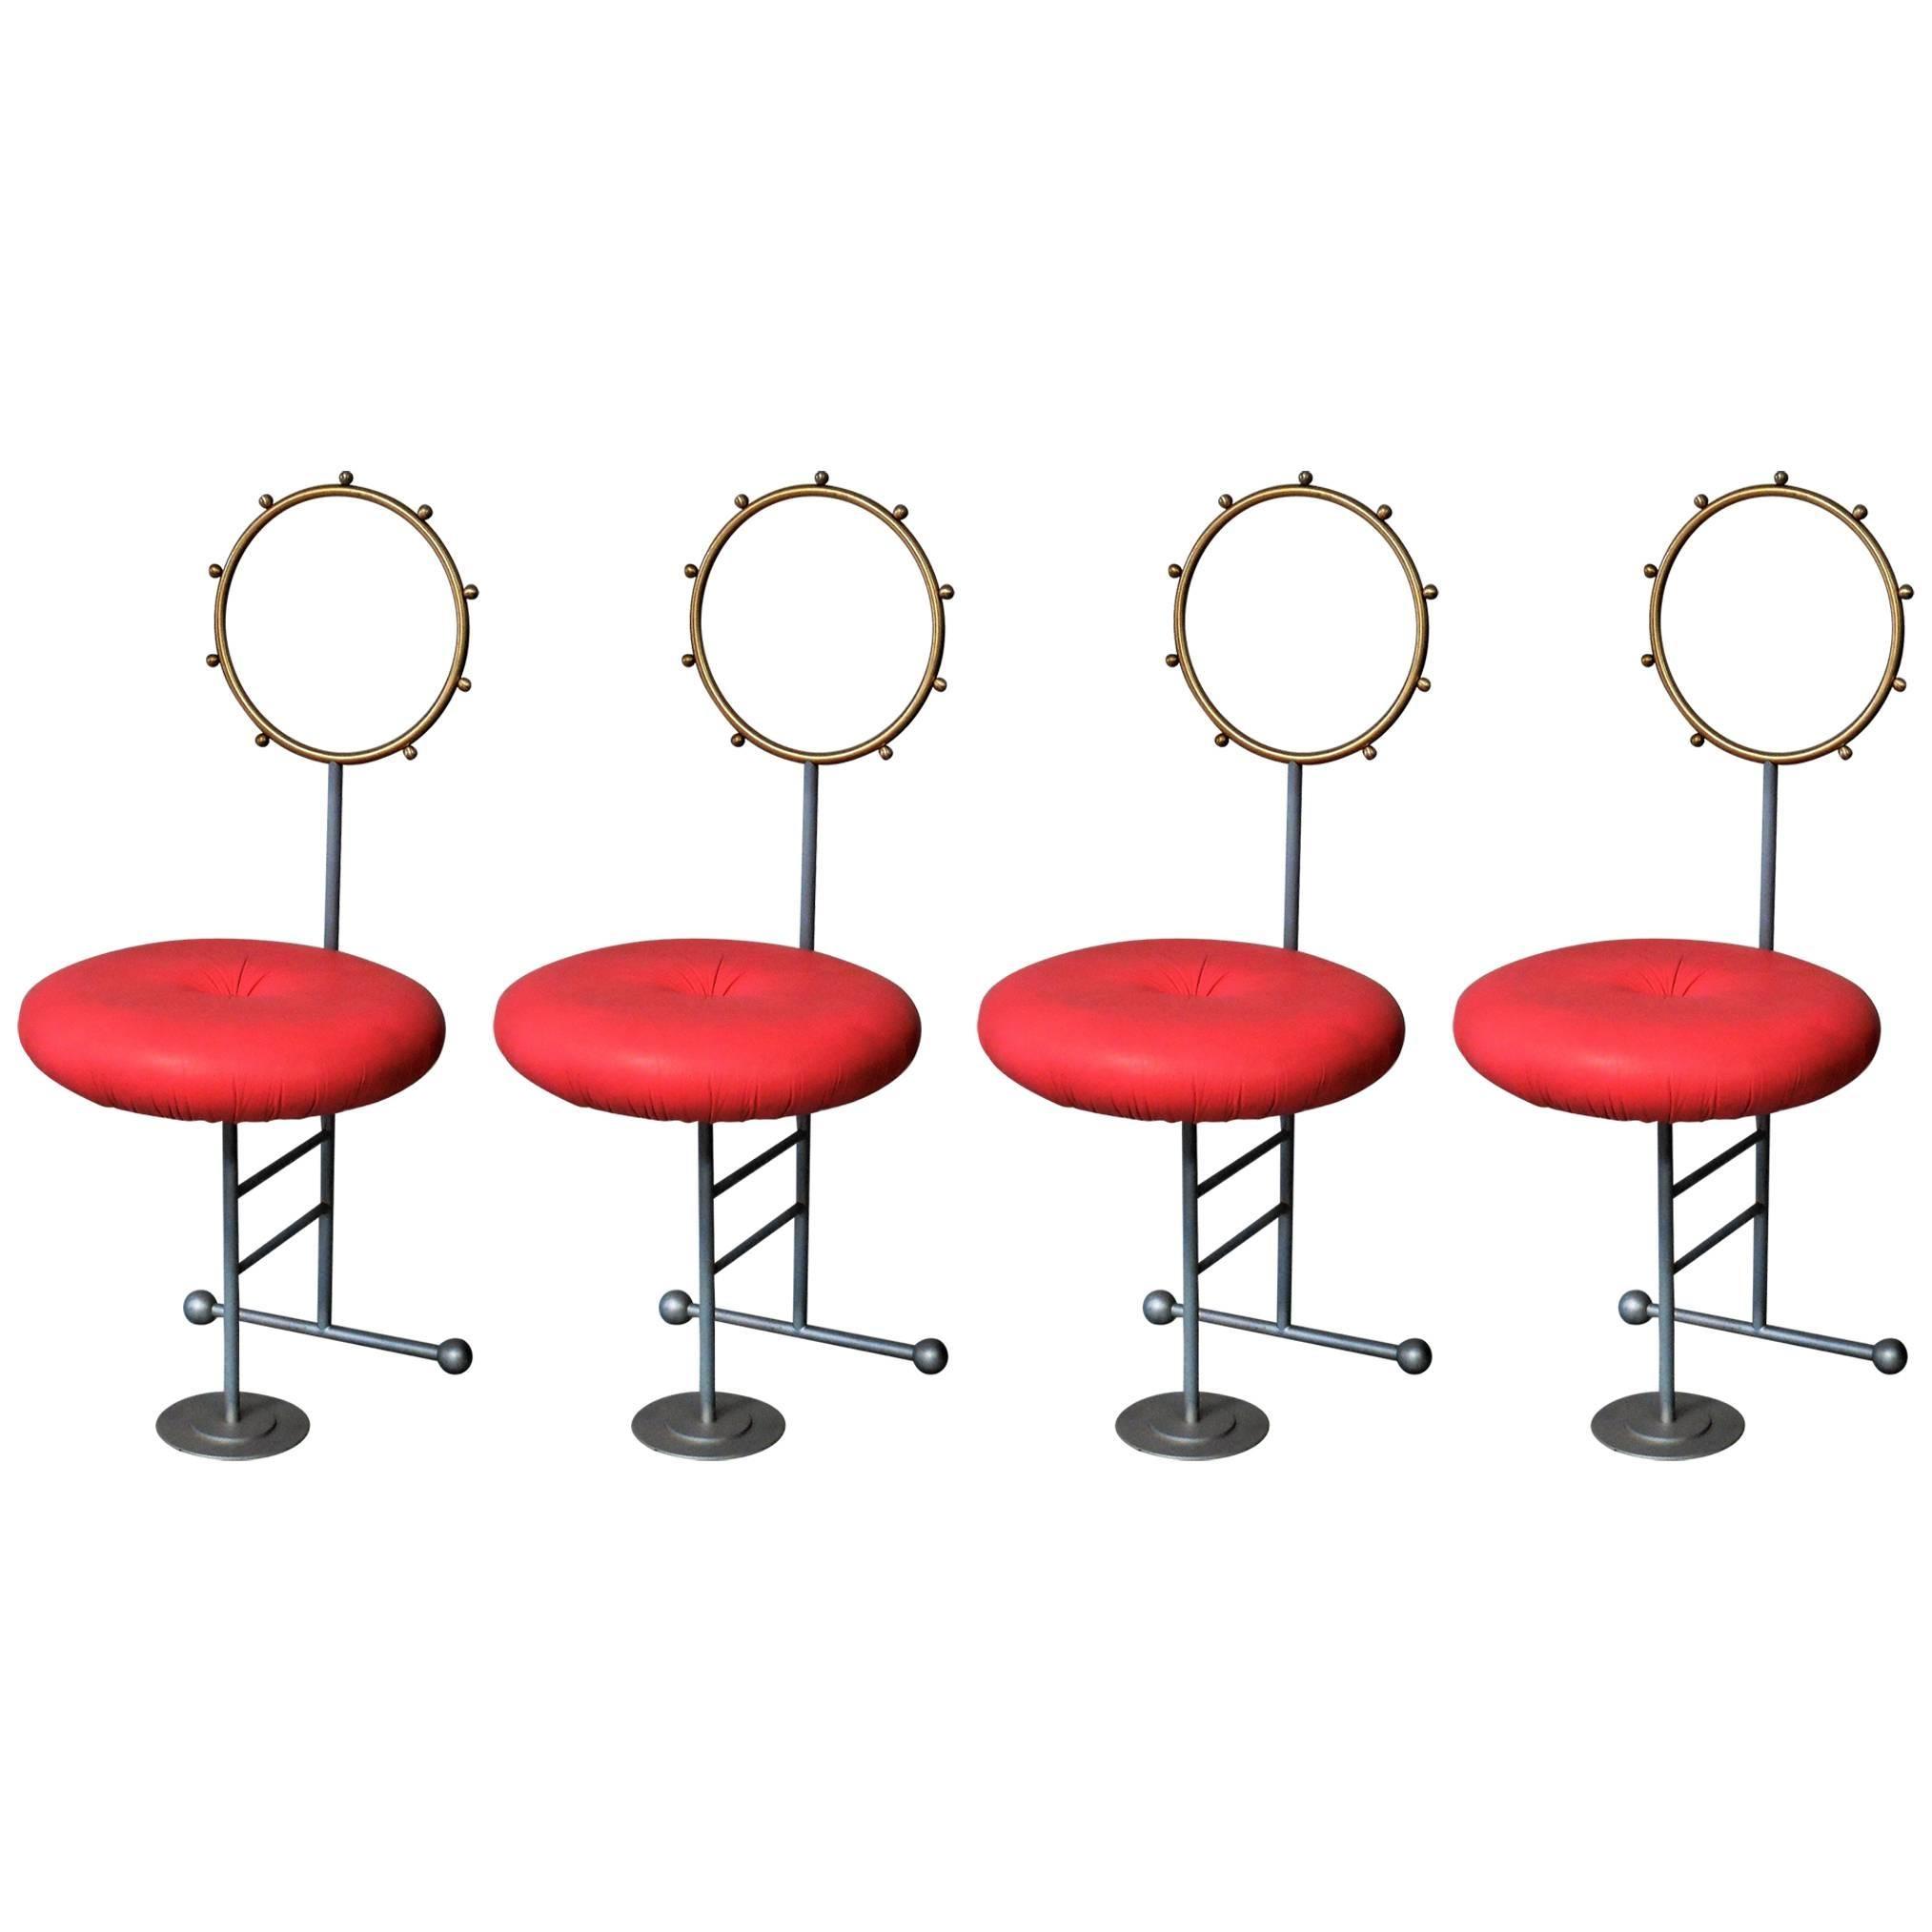 Luigi Serafini Santa Chairs For Sawaya And Moroni, Set Of Four 1